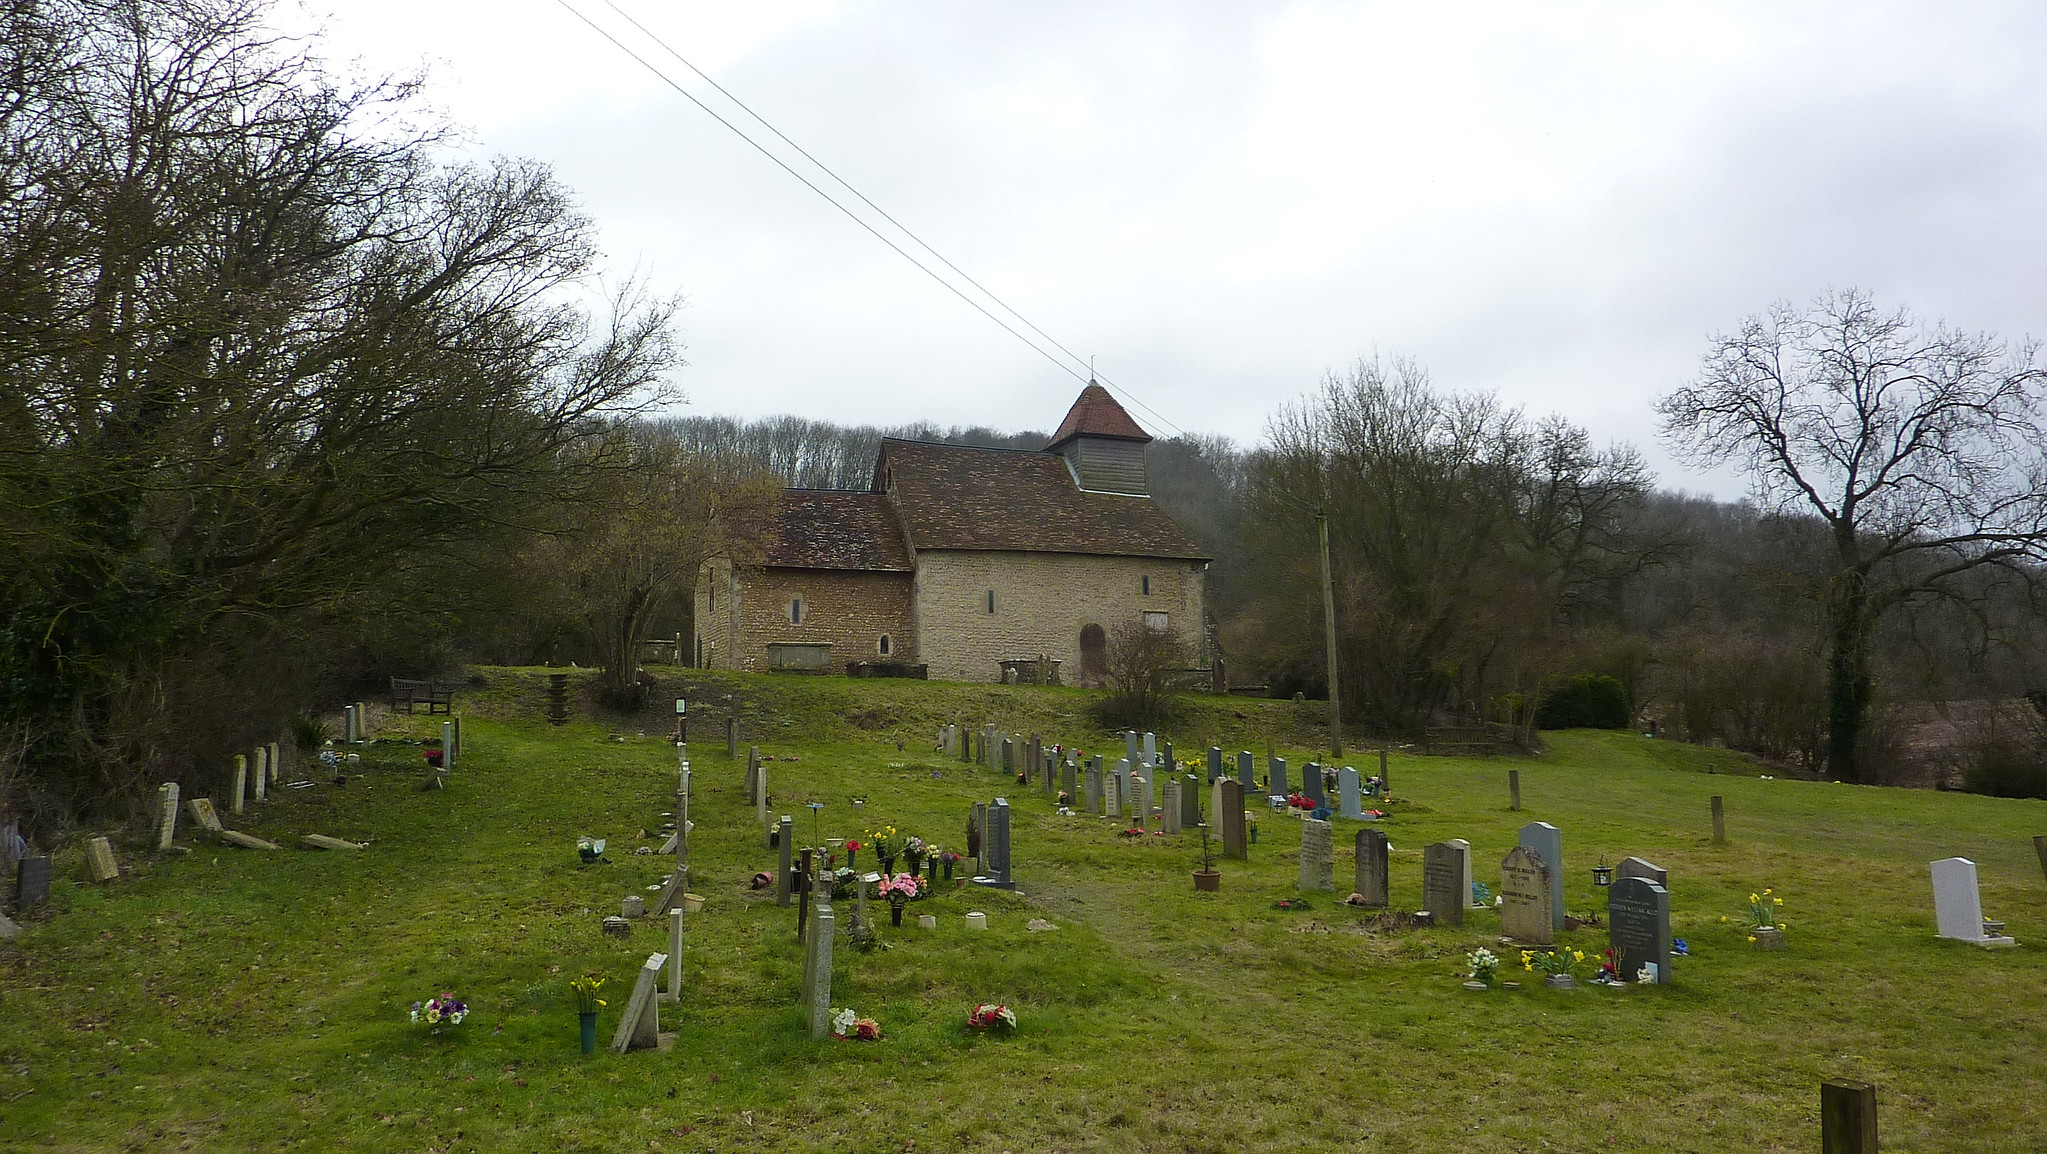 St Andrew's Church in Chilcomb